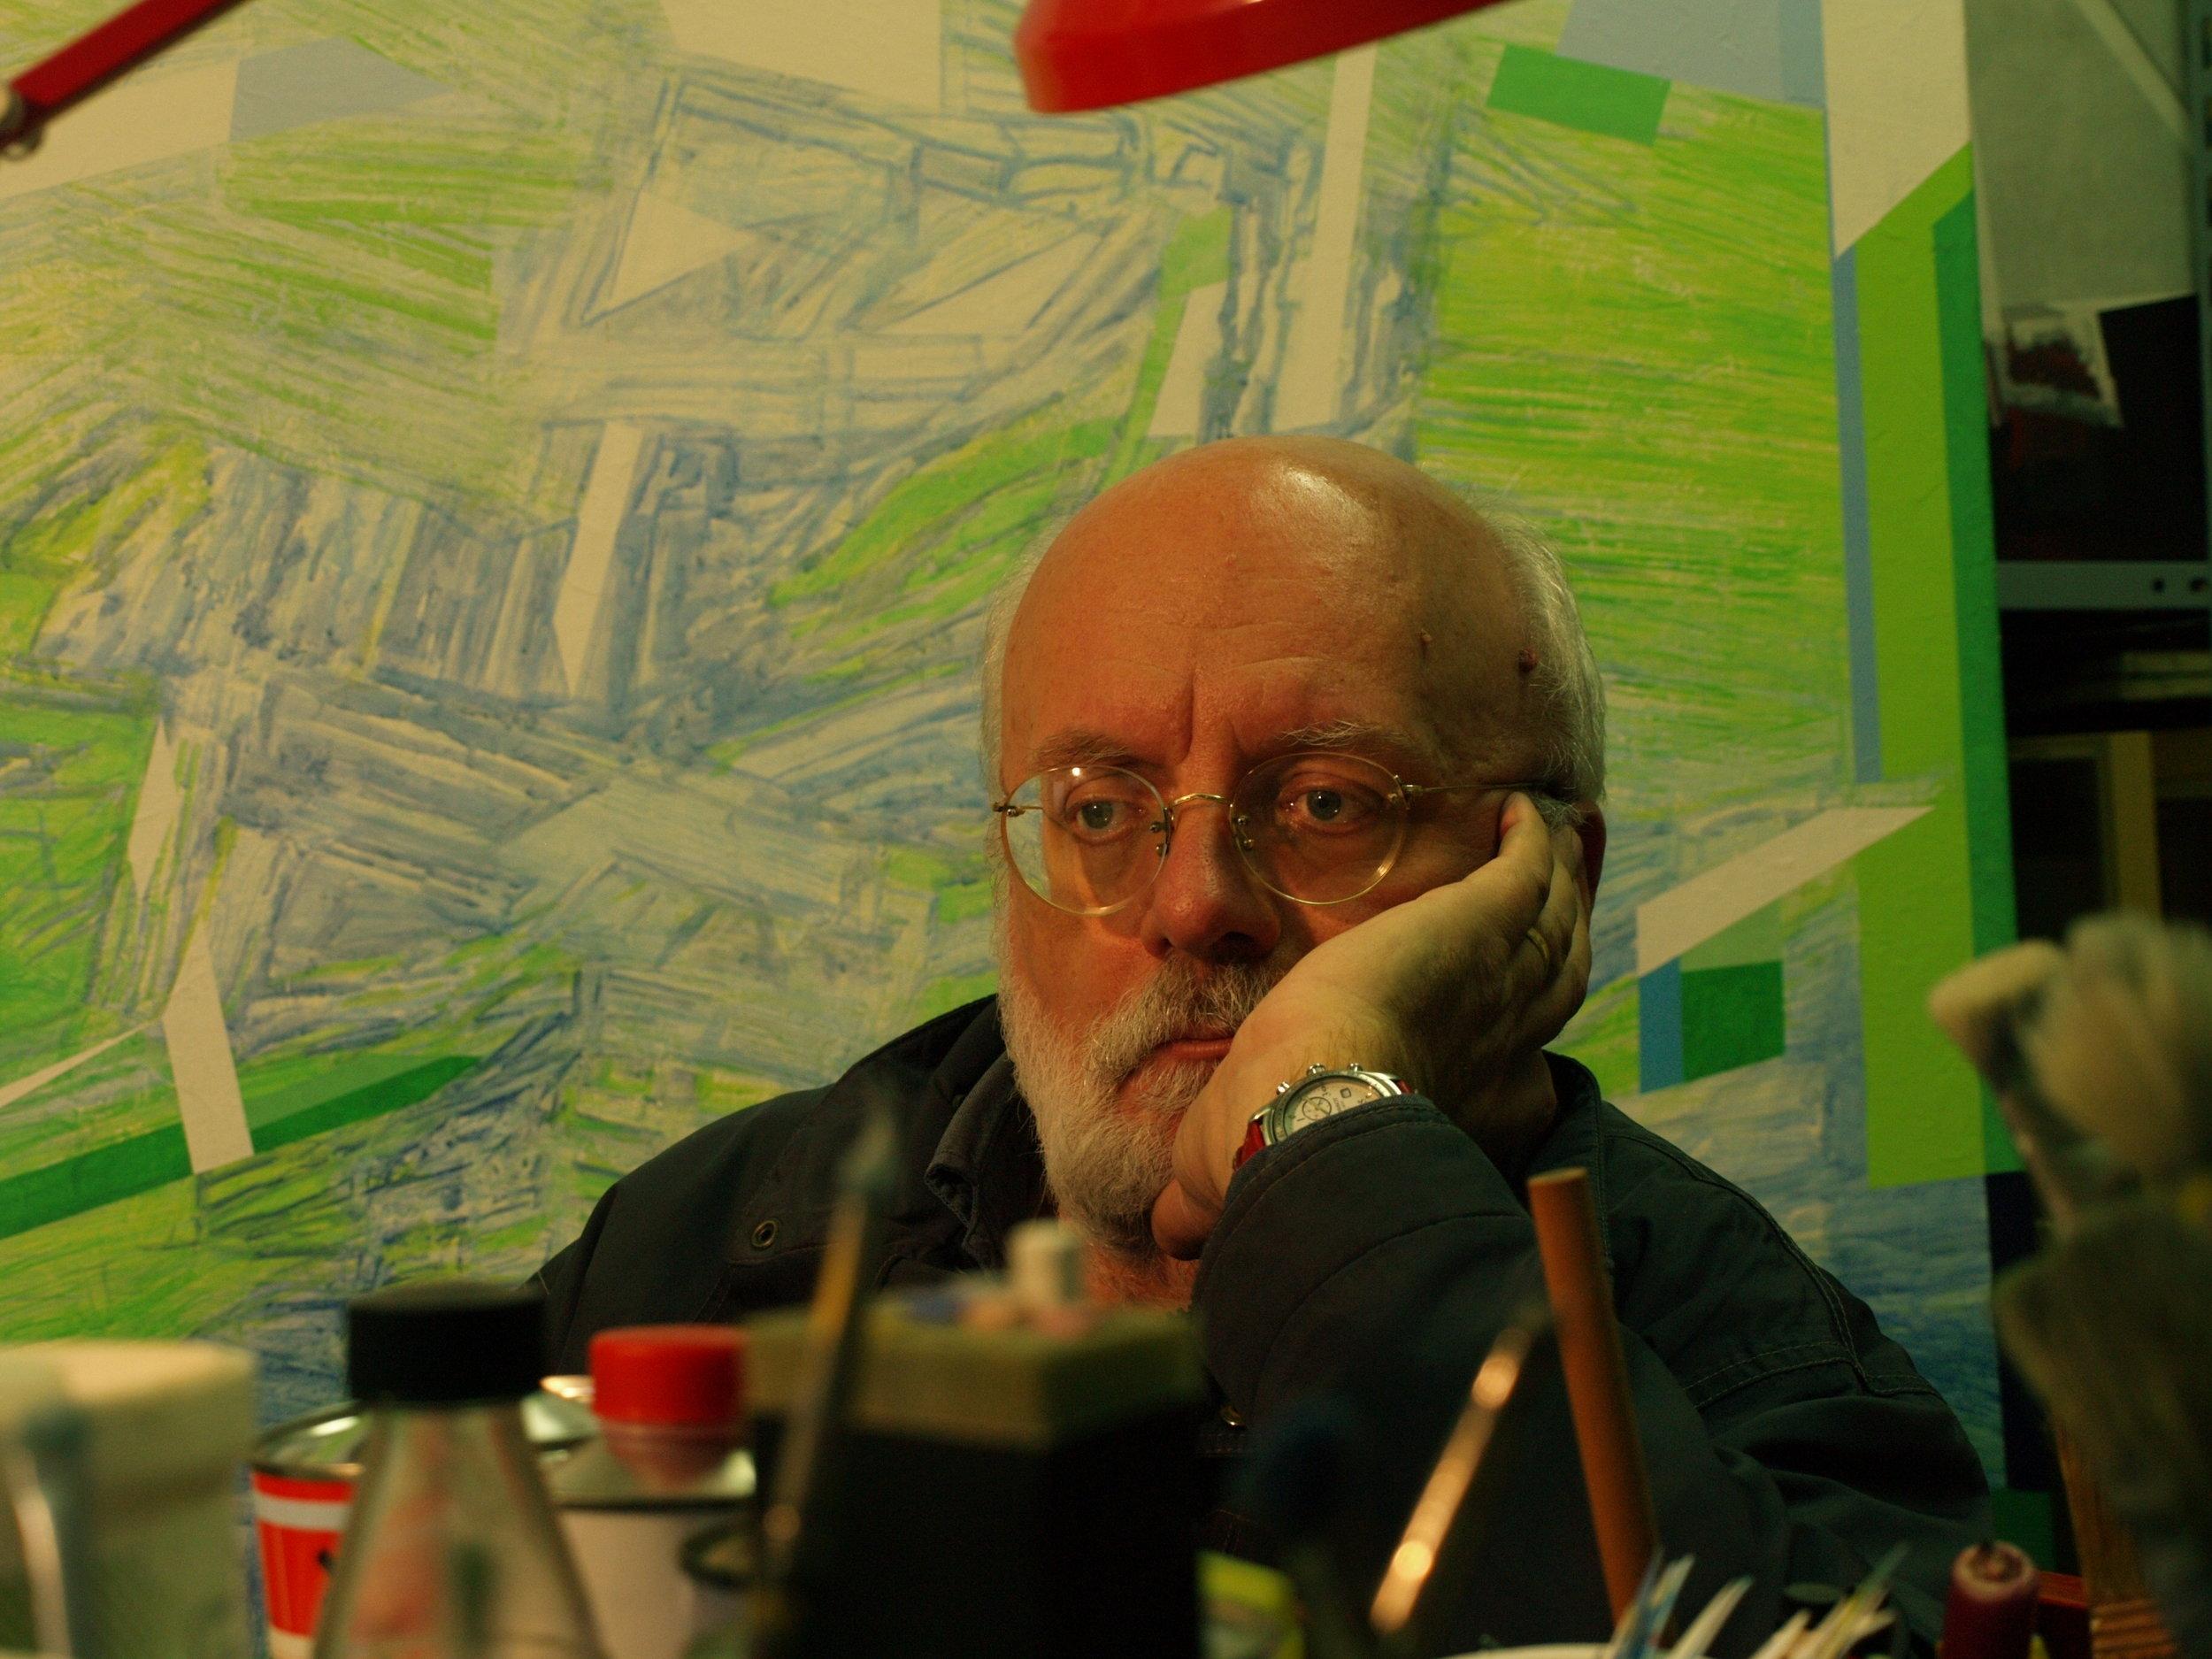 Luciano De Gironcoli in his studio in Cormòns (GO), Italy